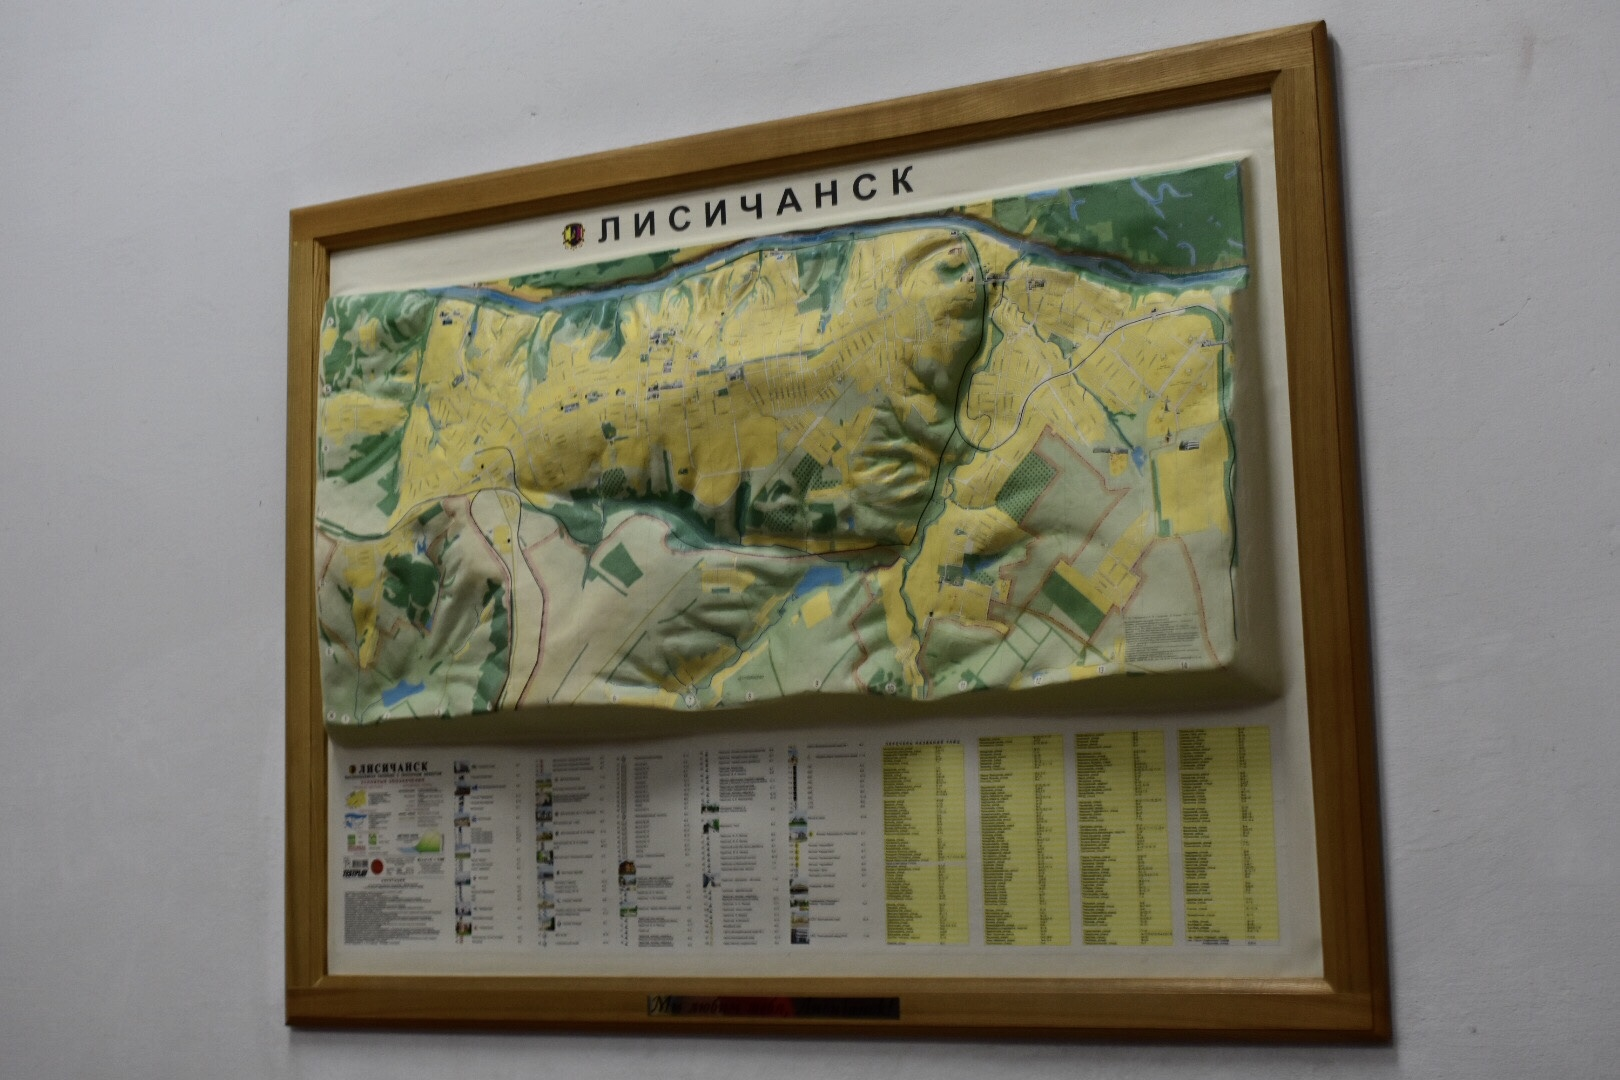 Lysychansk topographical map, Lysychansk Regional Museum